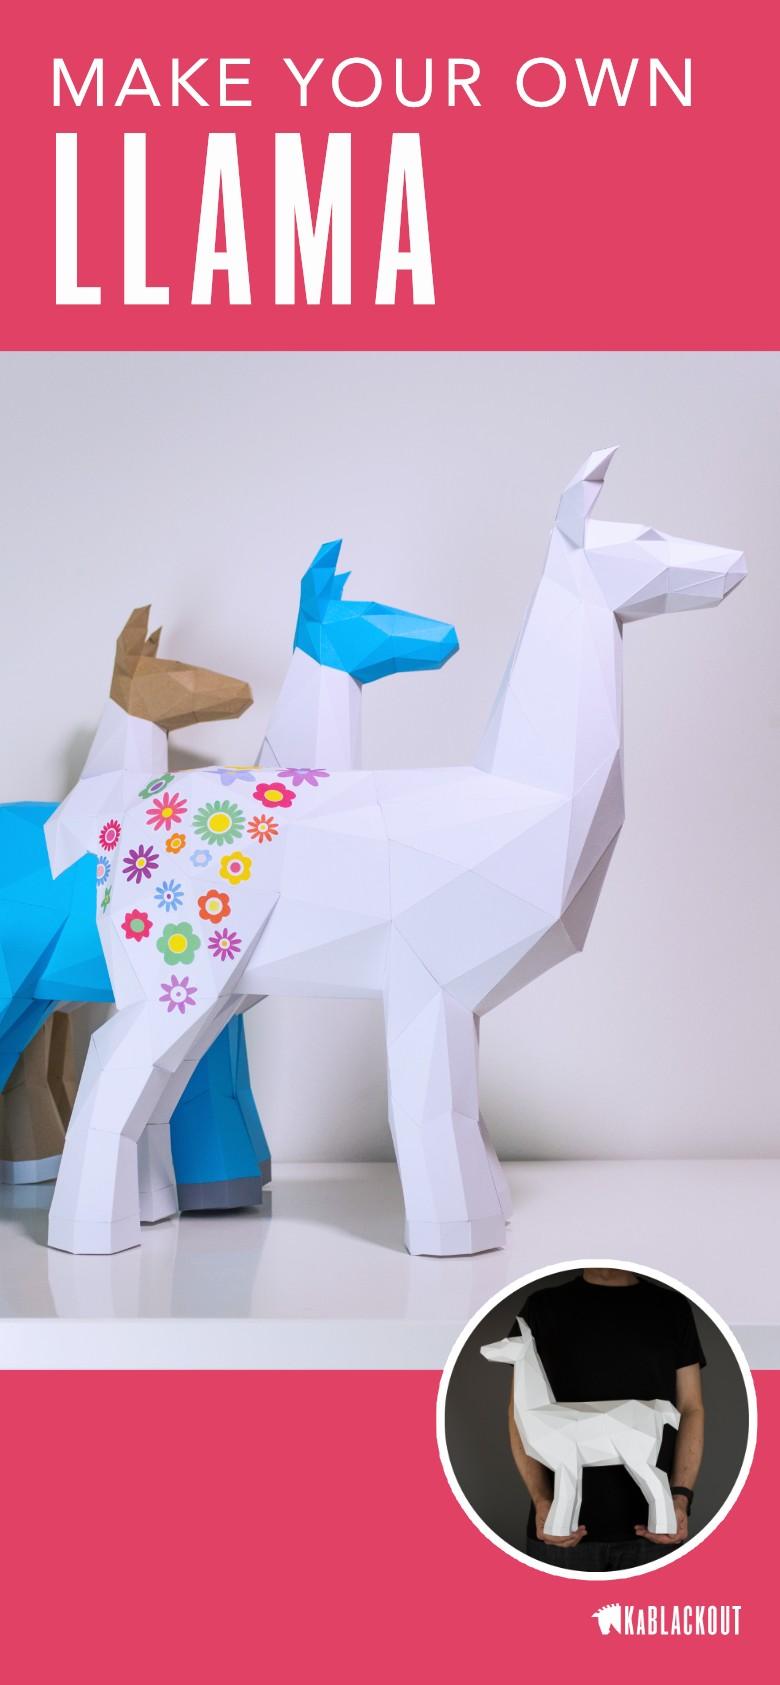 Lion Papercraft Llama Papercraft Low Poly Llama Paper Llama Craft Llama Lover